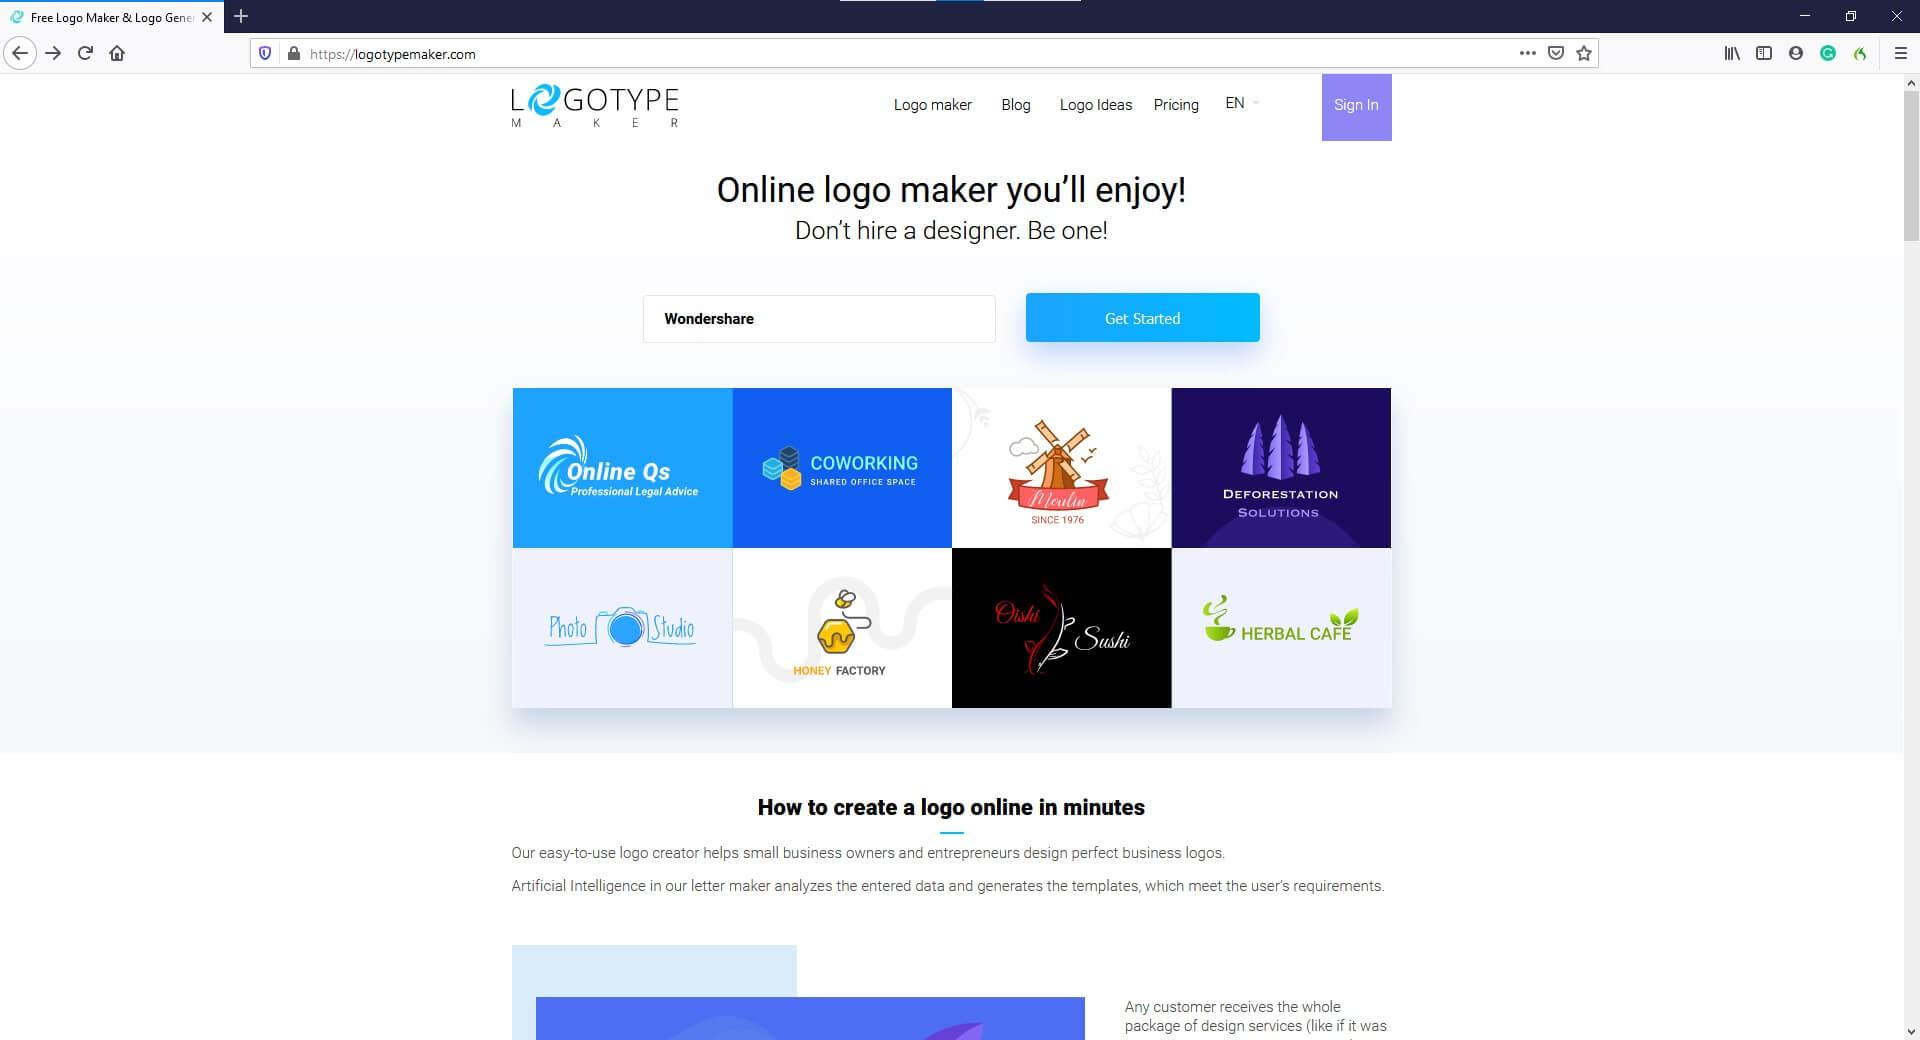 AI Logo Creator - LogotypeMaker